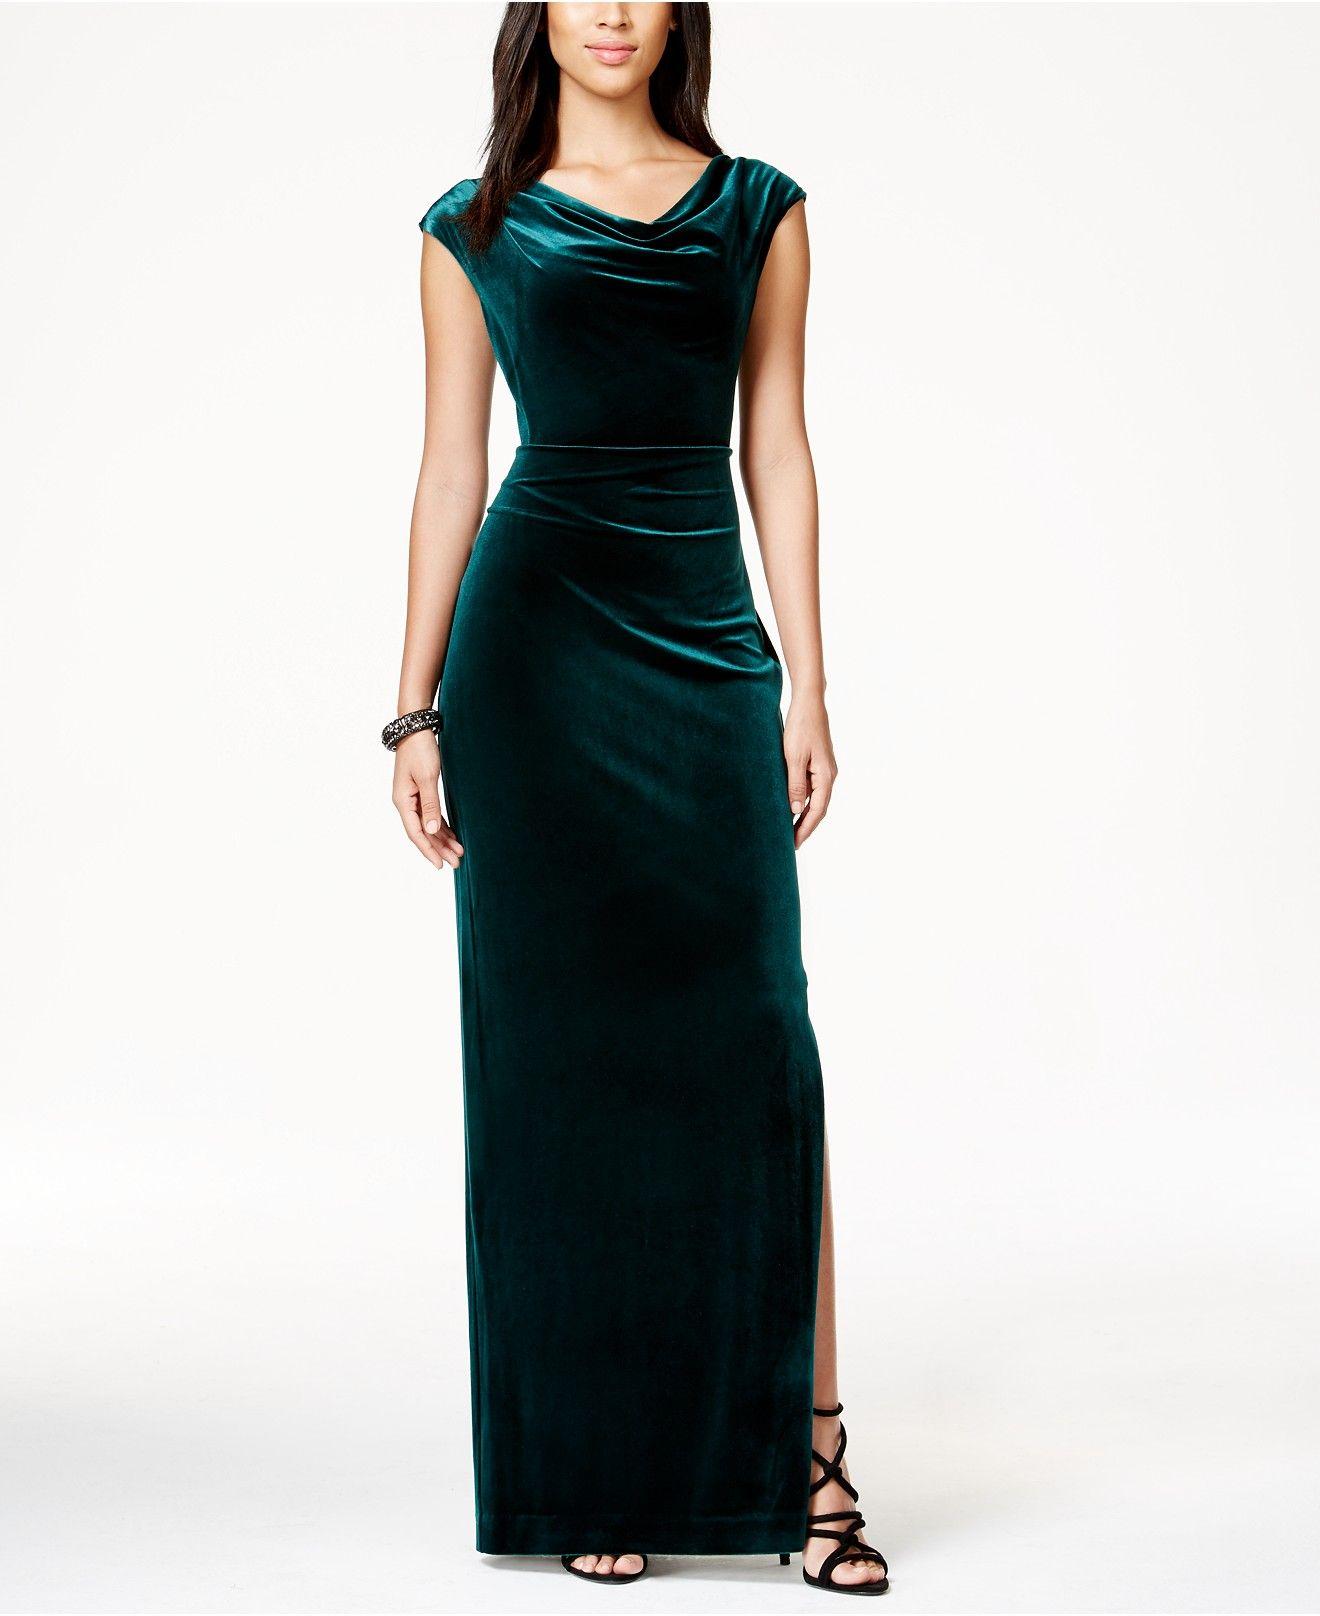 fb6dd6c0023d Vince Camuto Cowl-Neck Velvet Gown - Dresses - Women - Macy s ...